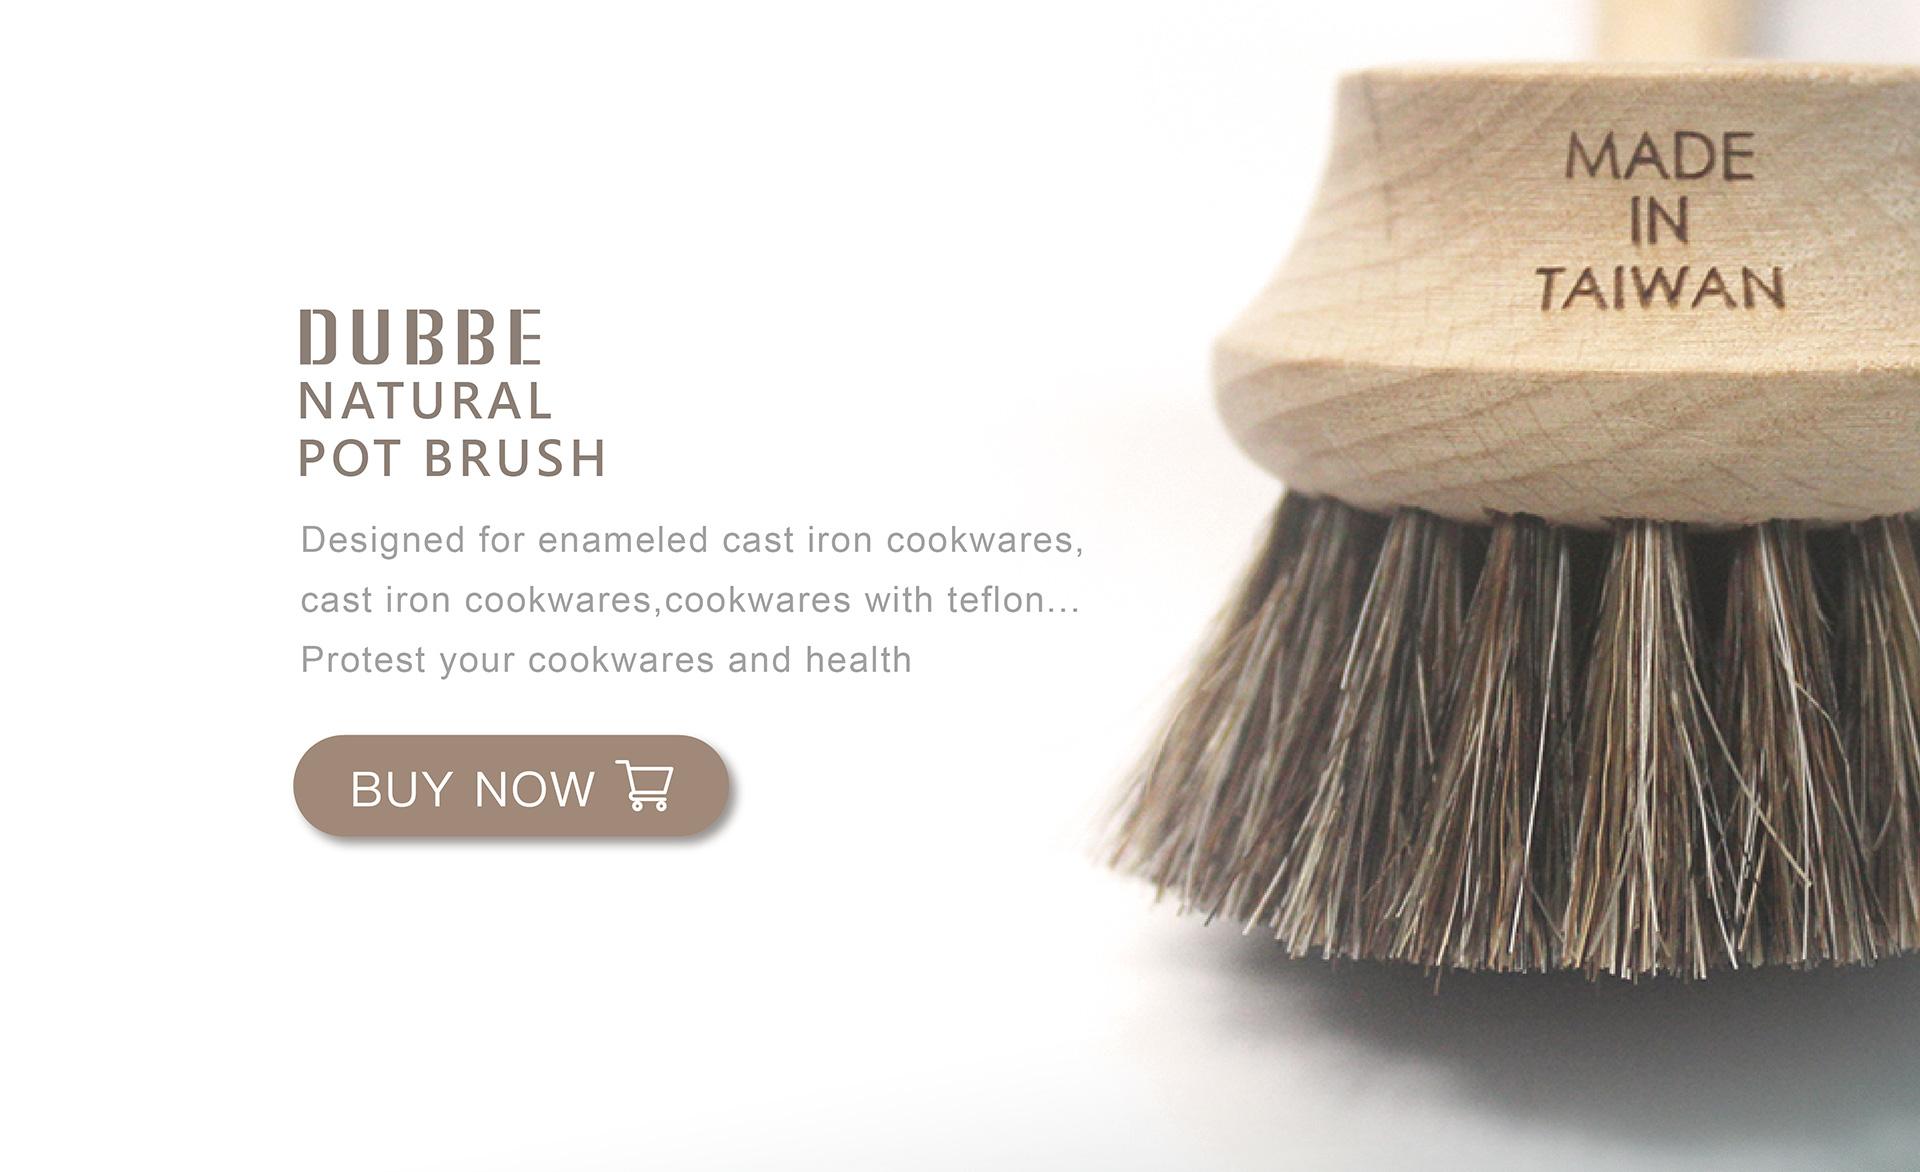 DUBBE Natural pot brush